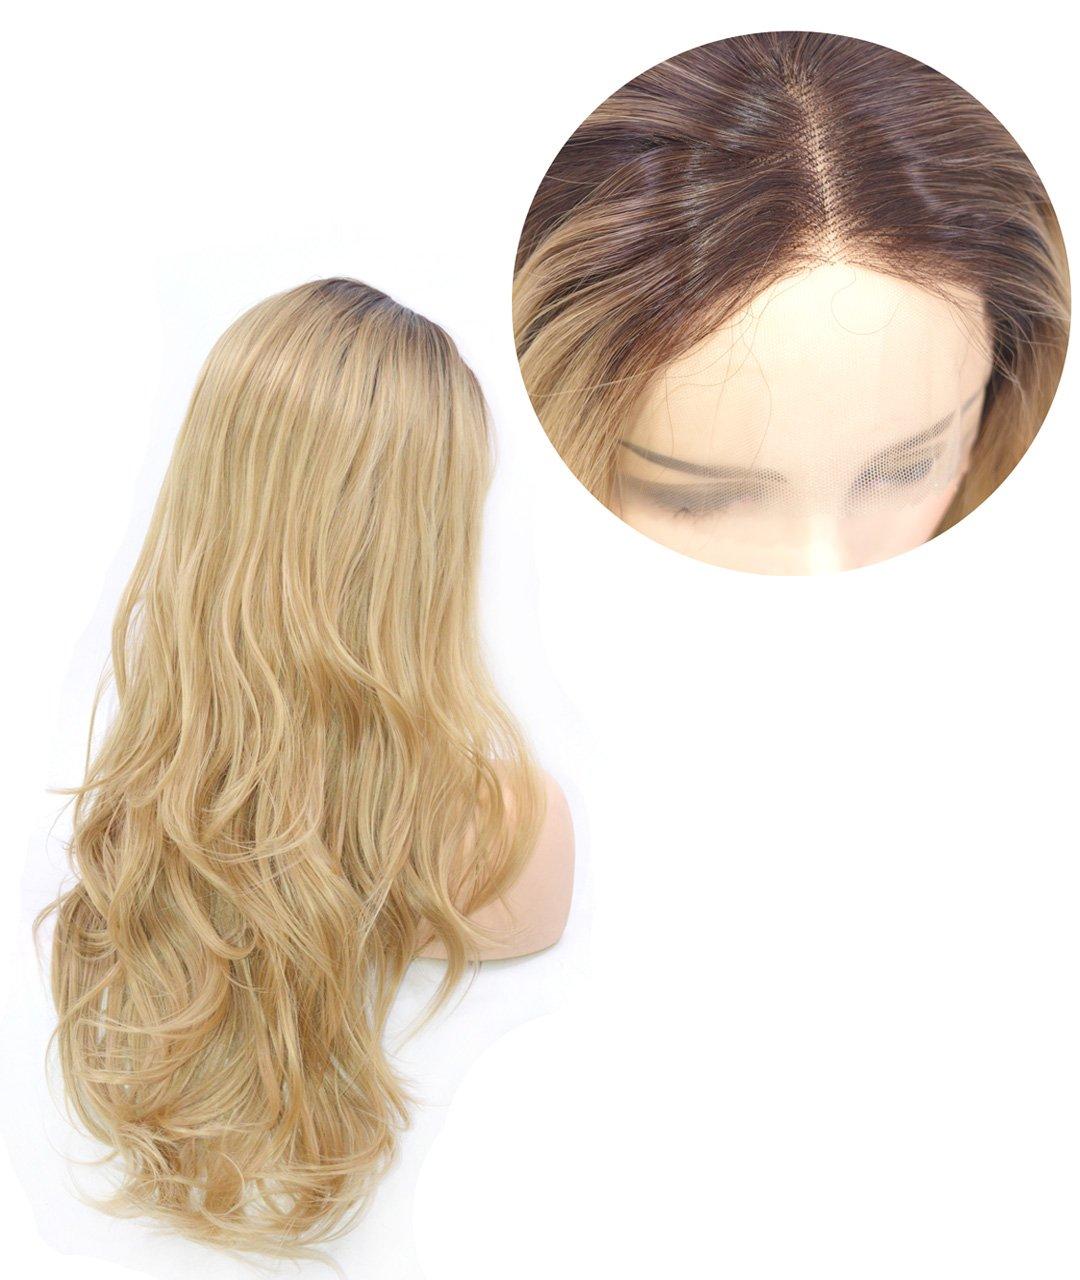 peluca rubia de ondas